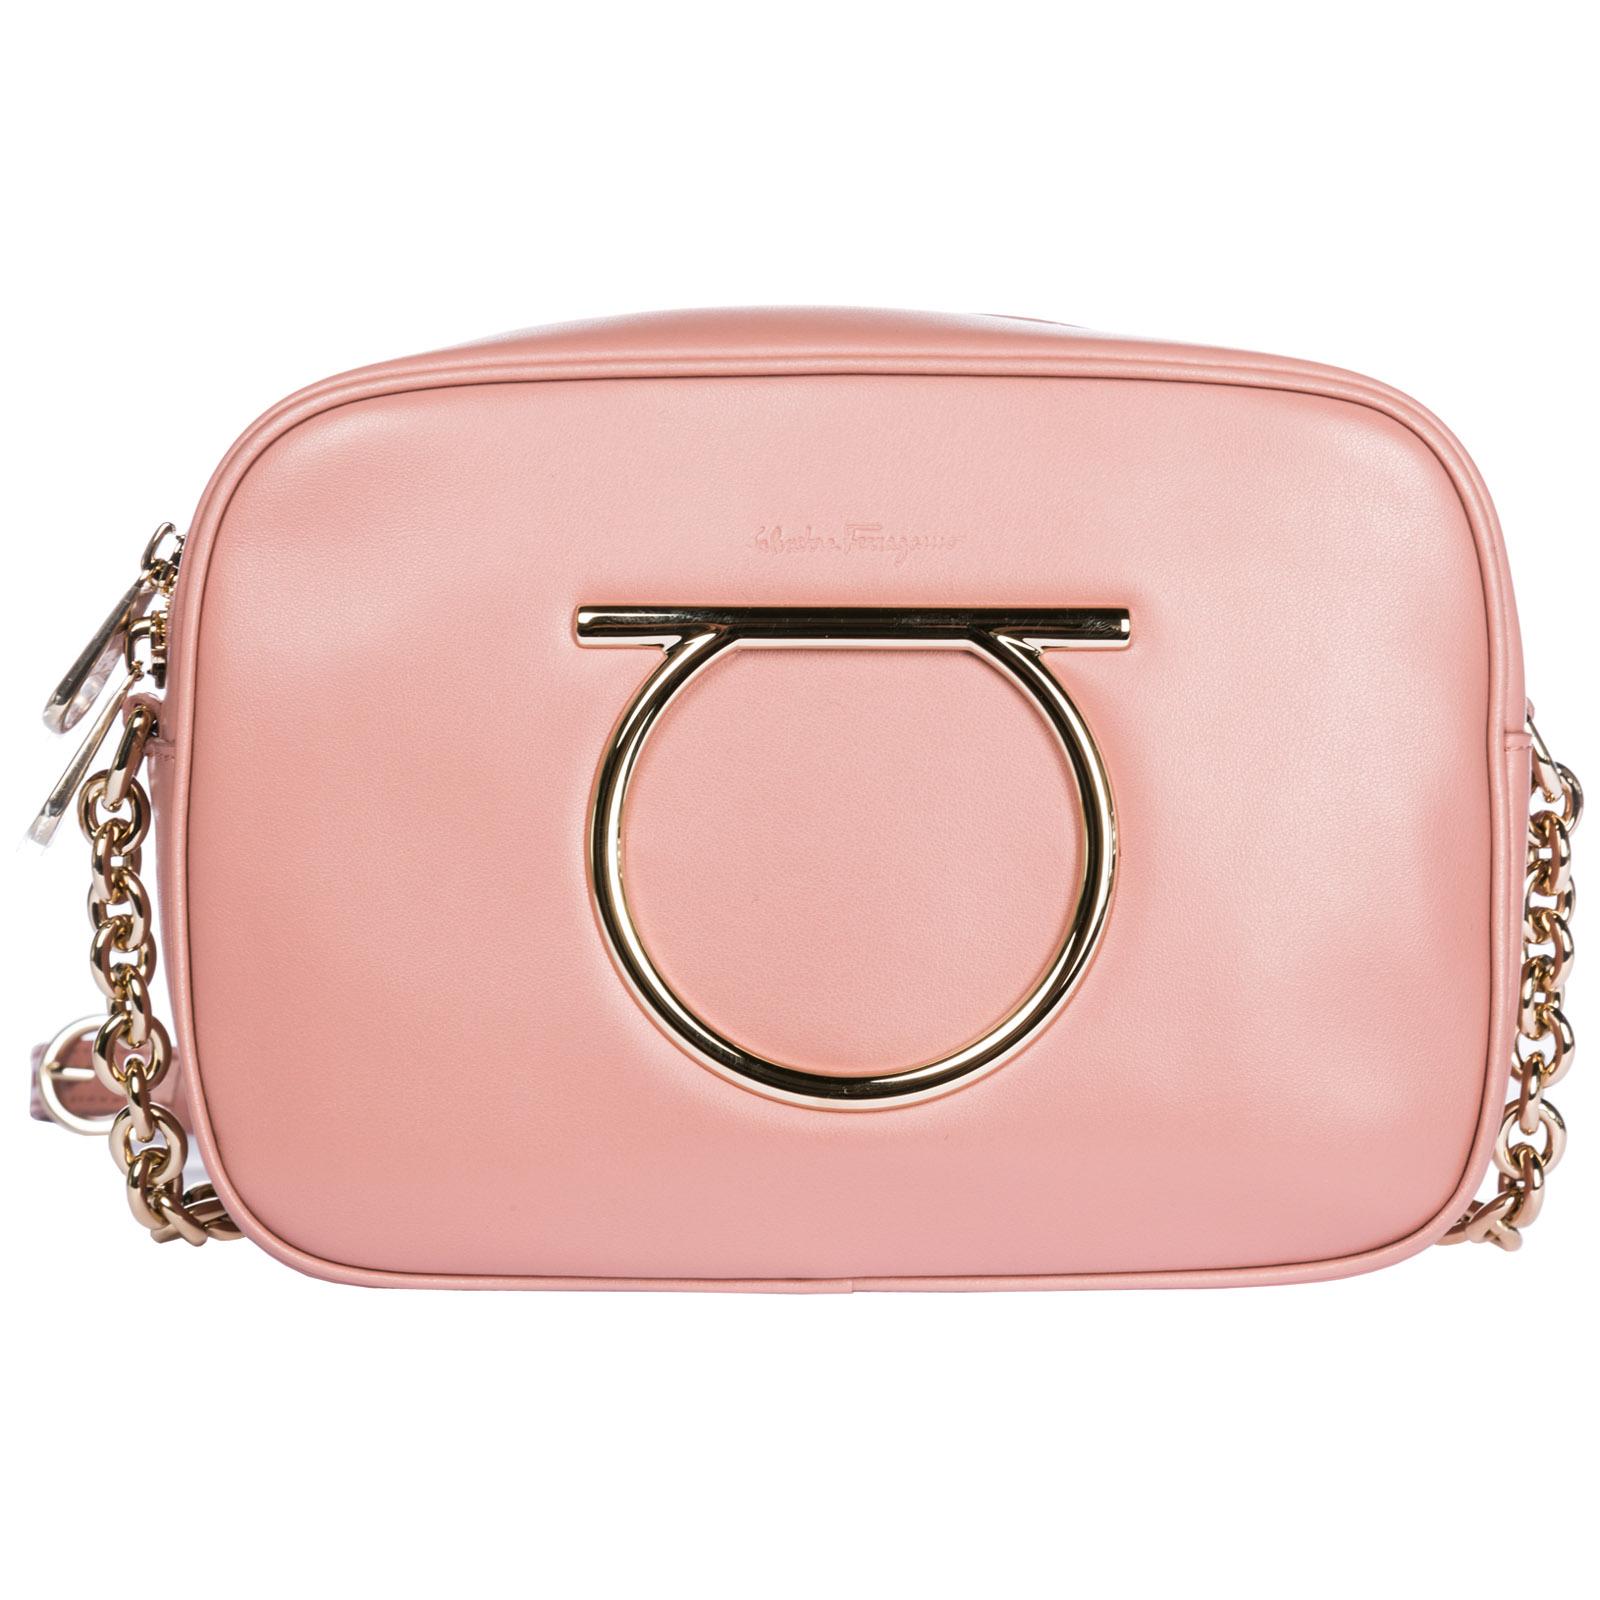 Salvatore Ferragamo Women S Leather Cross-Body Messenger Shoulder Bag  Camera Bag Gancini In Pink 82cd7631ac